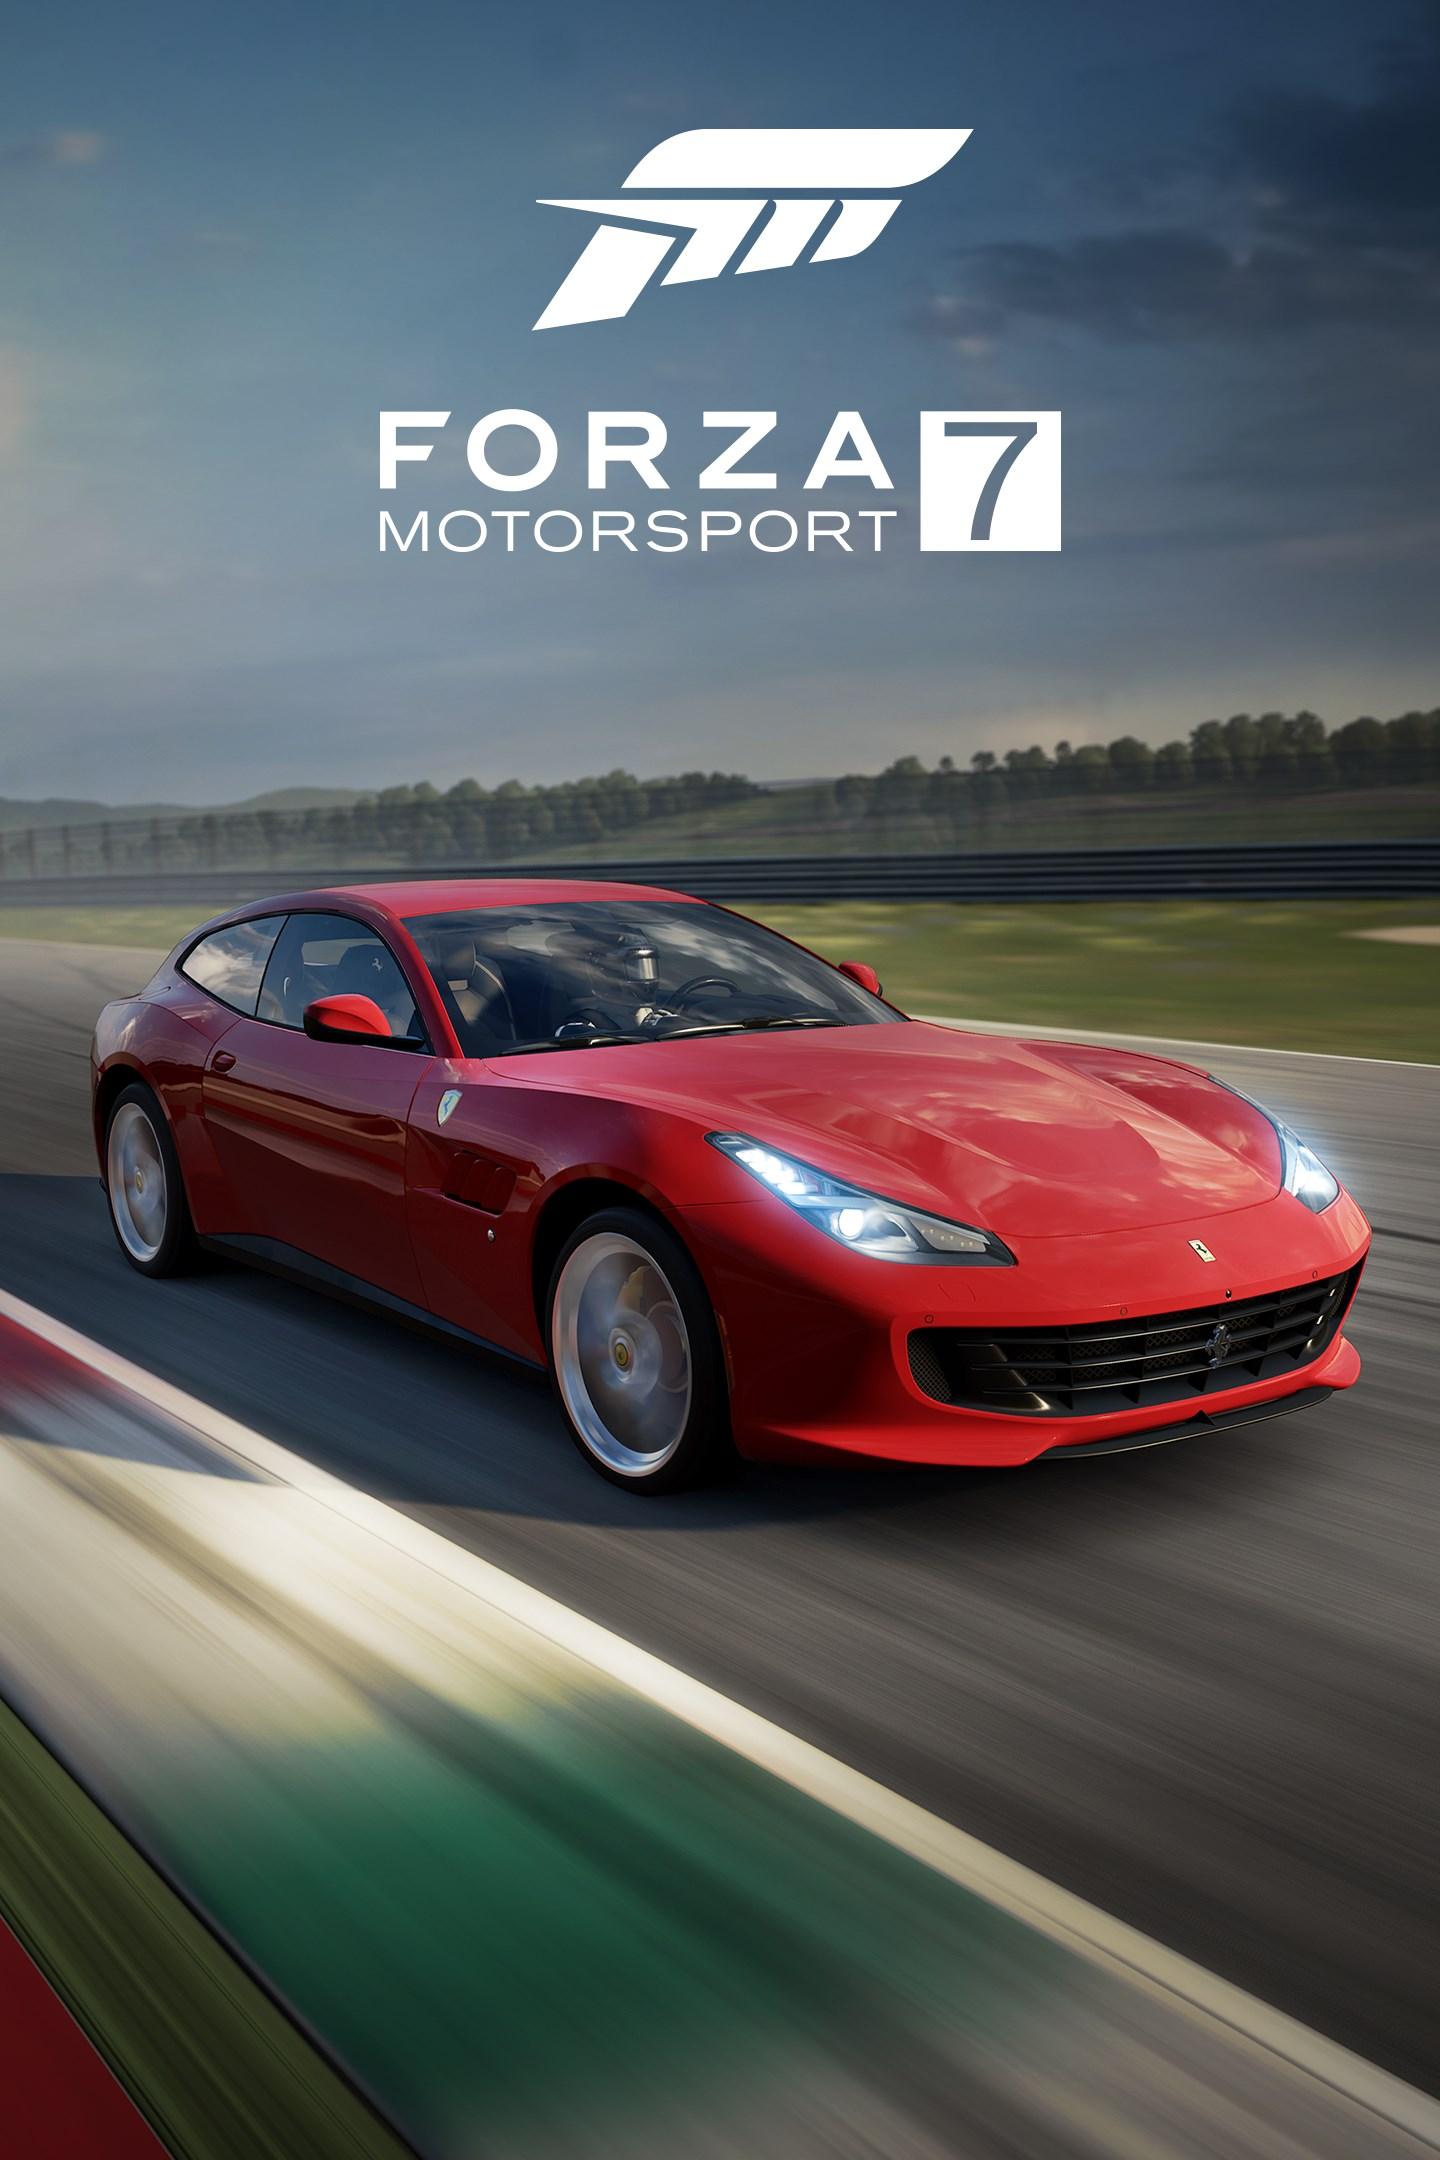 Get Forza Motorsport 7 2017 Ferrari Gtc4lusso Microsoft Store En Sa